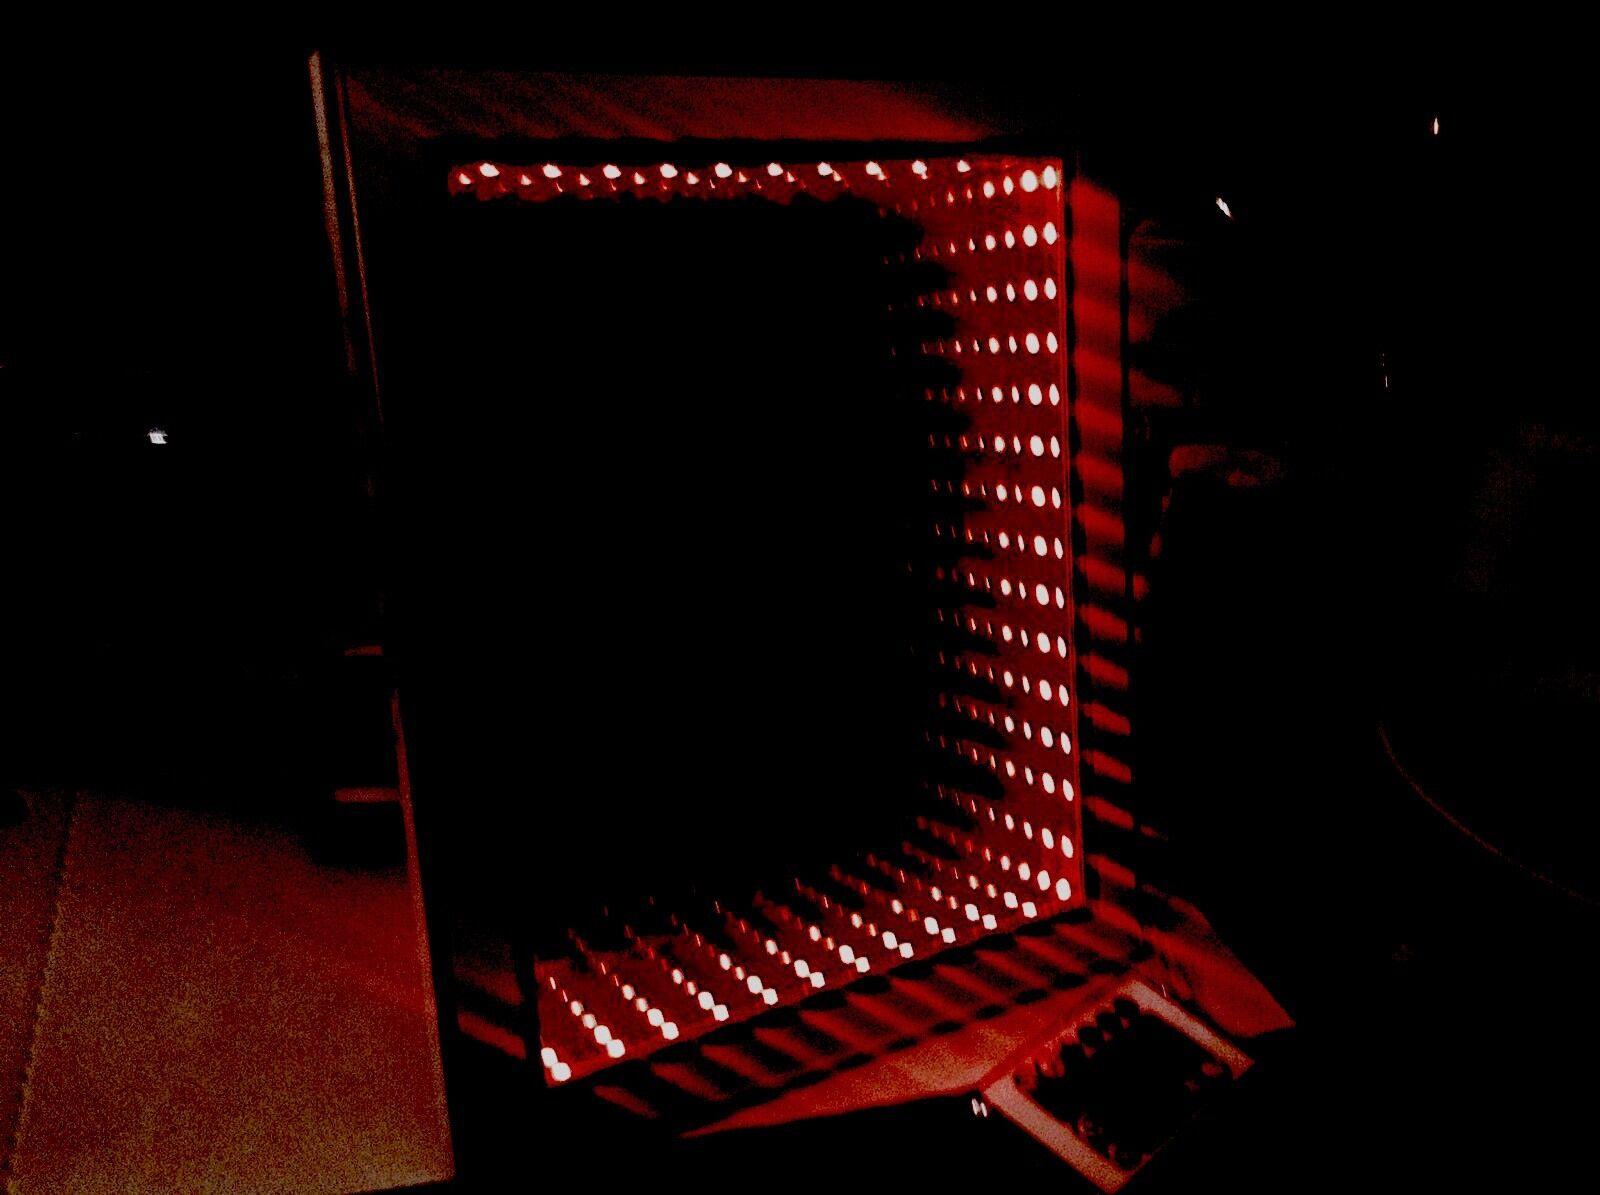 , Gift Led 3D Sensory Illuminated Infinity Illusion Handmade mirror 17 x21